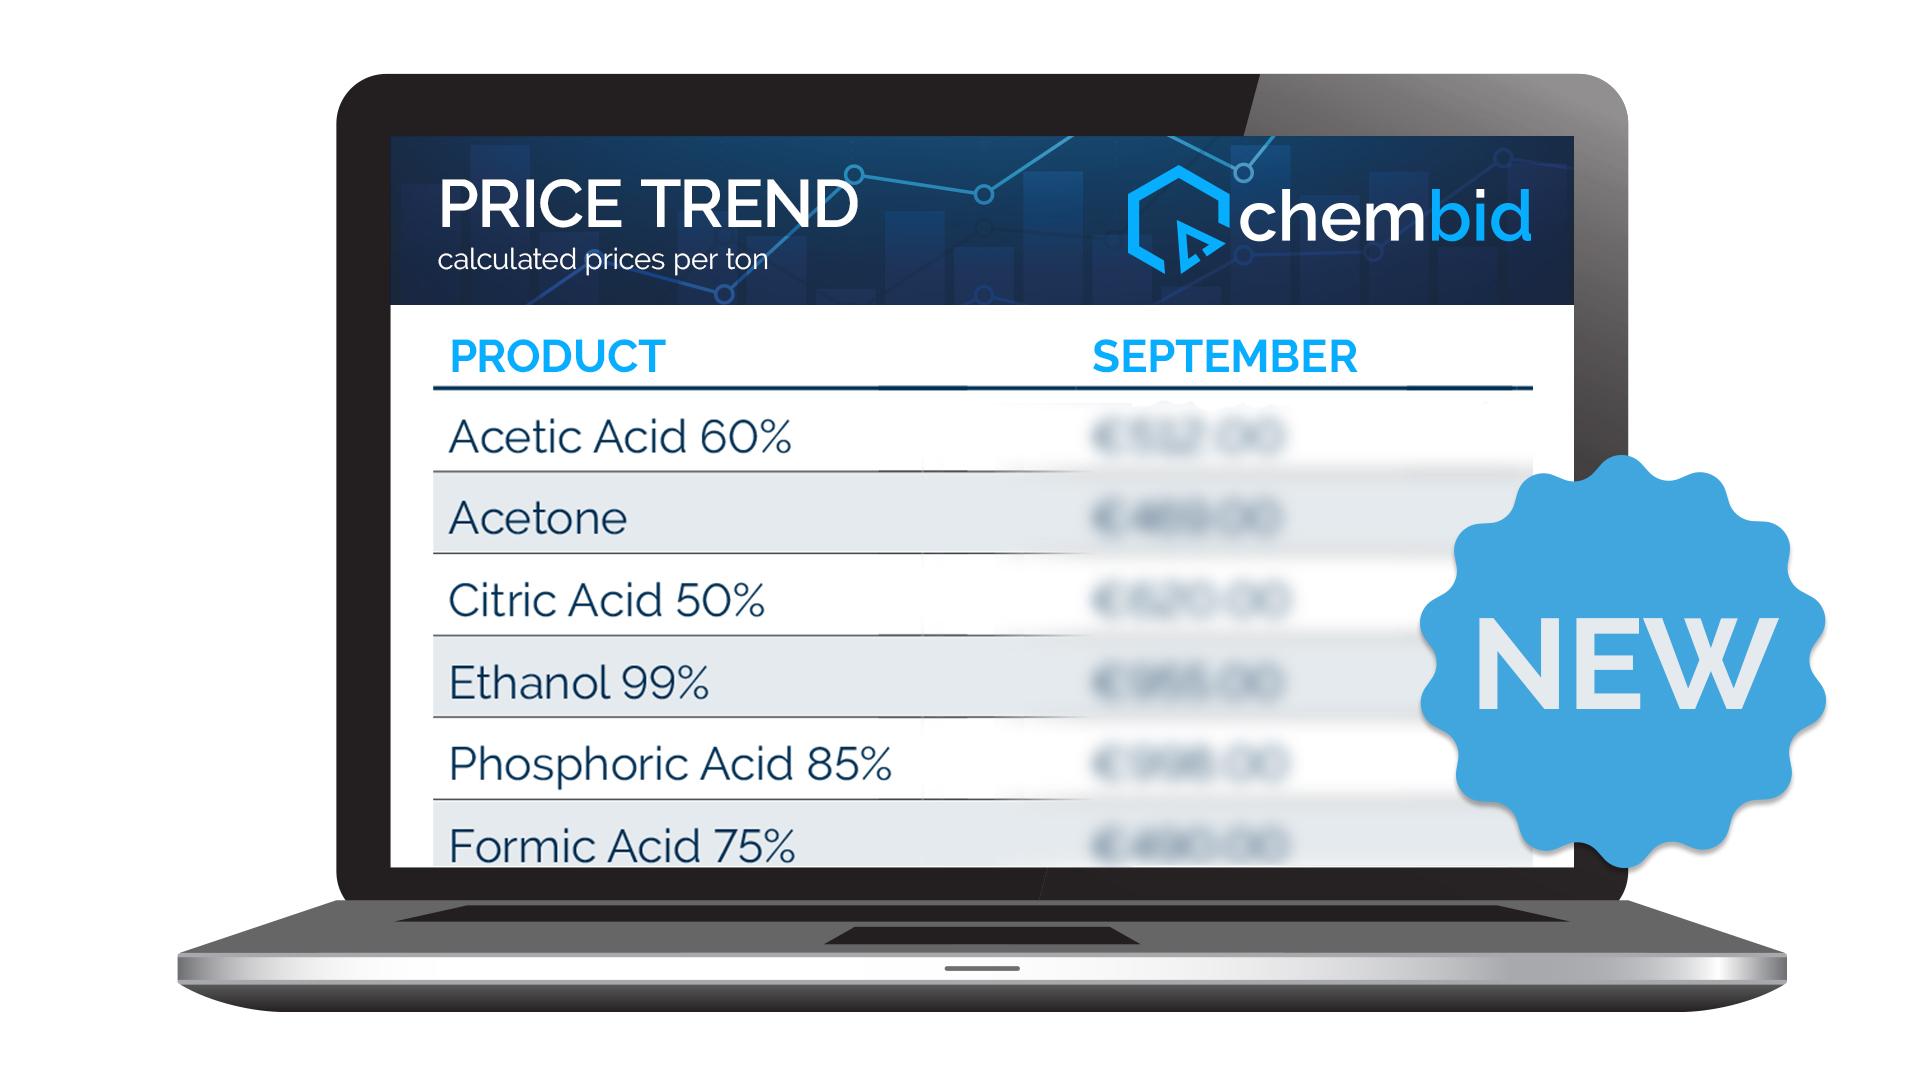 chembid Price Trend